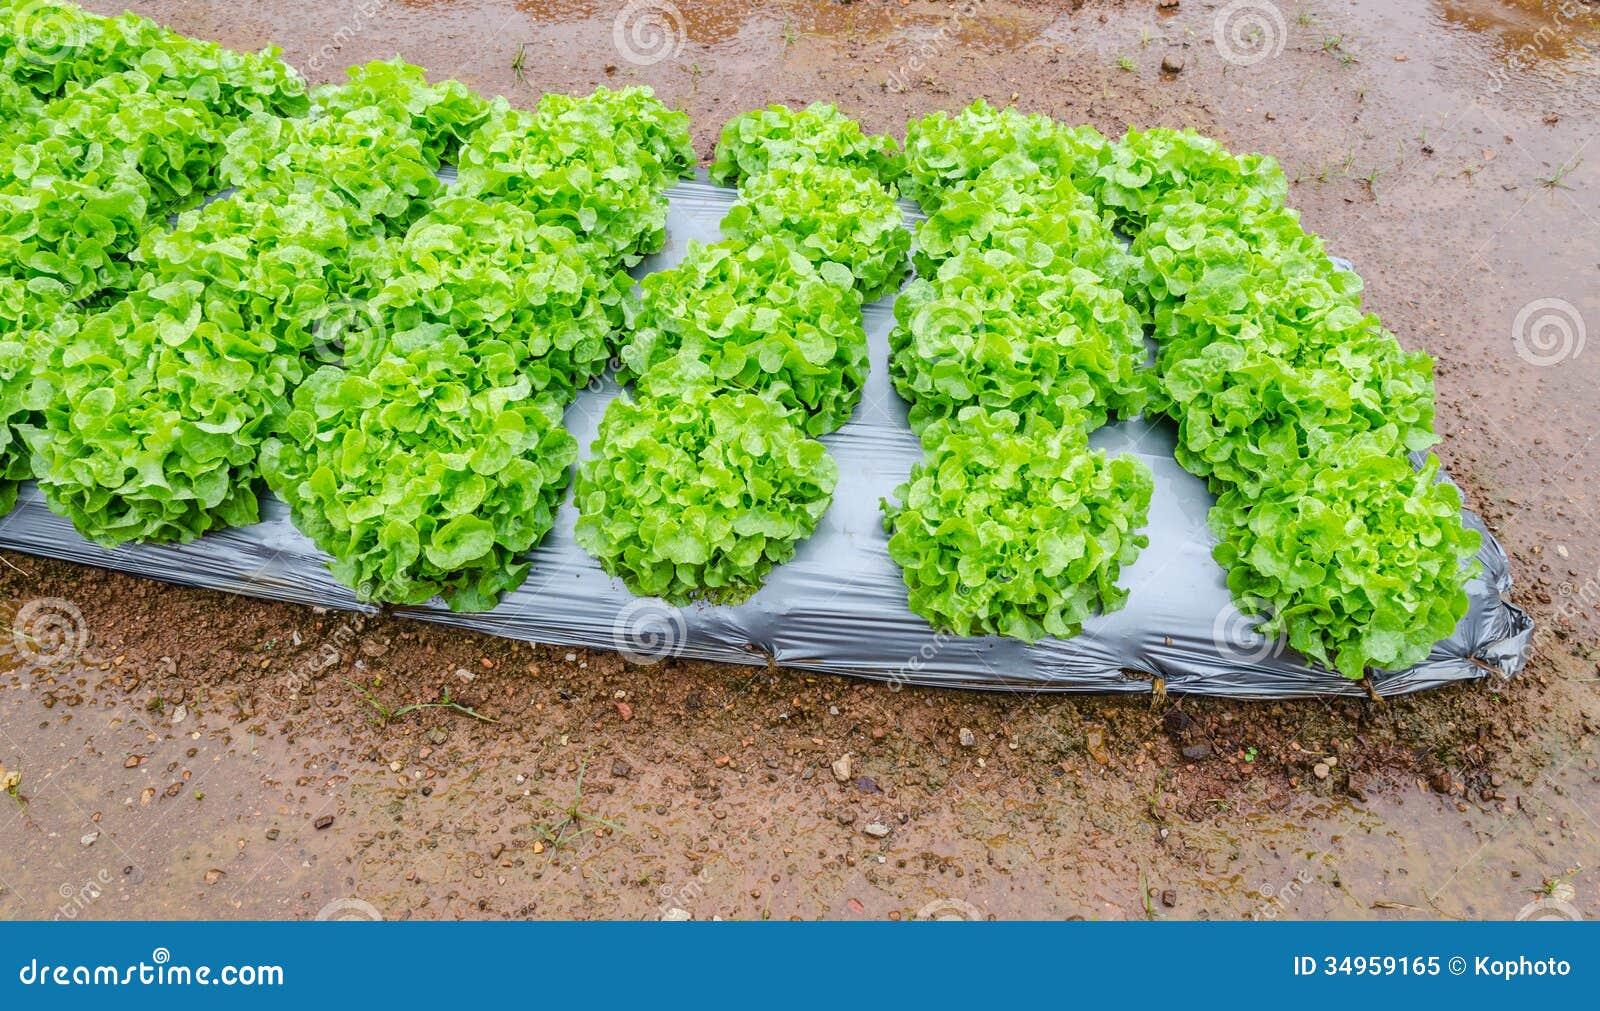 Growing Vegetable Garden Stock Image Image Of Film Bibb